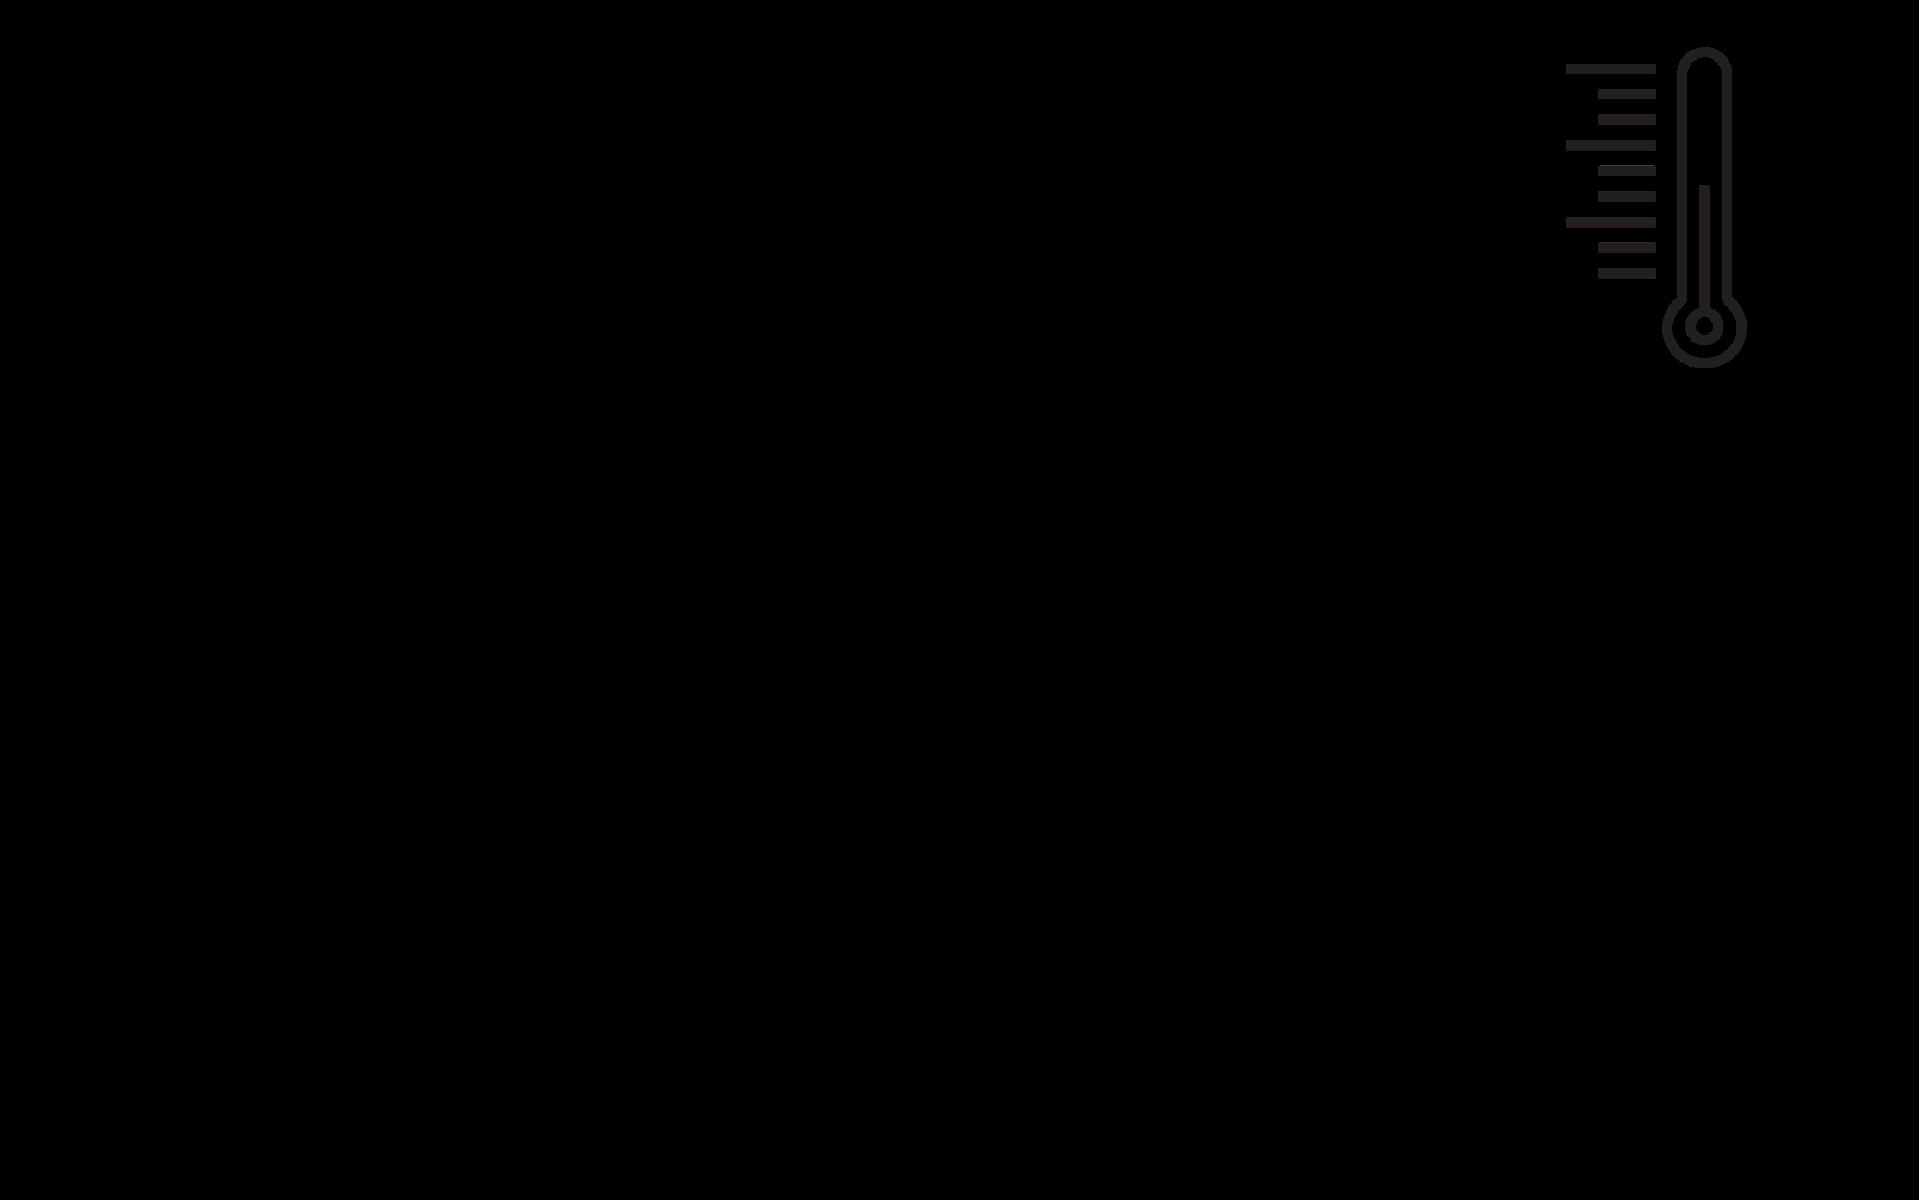 Icons - UltraPet Underlay